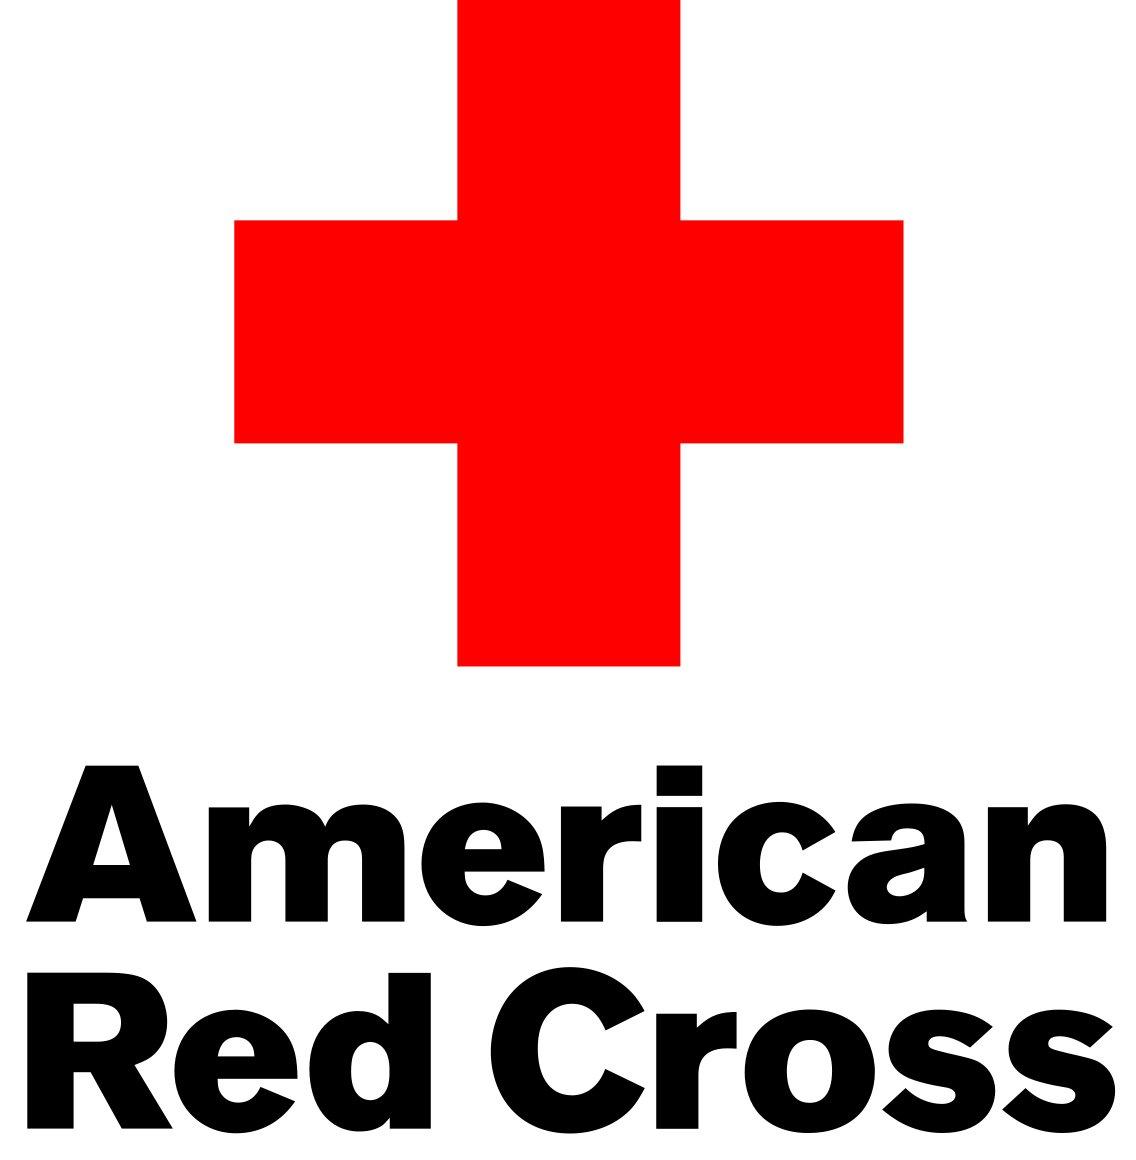 American Red Cross Blood Drive Logo